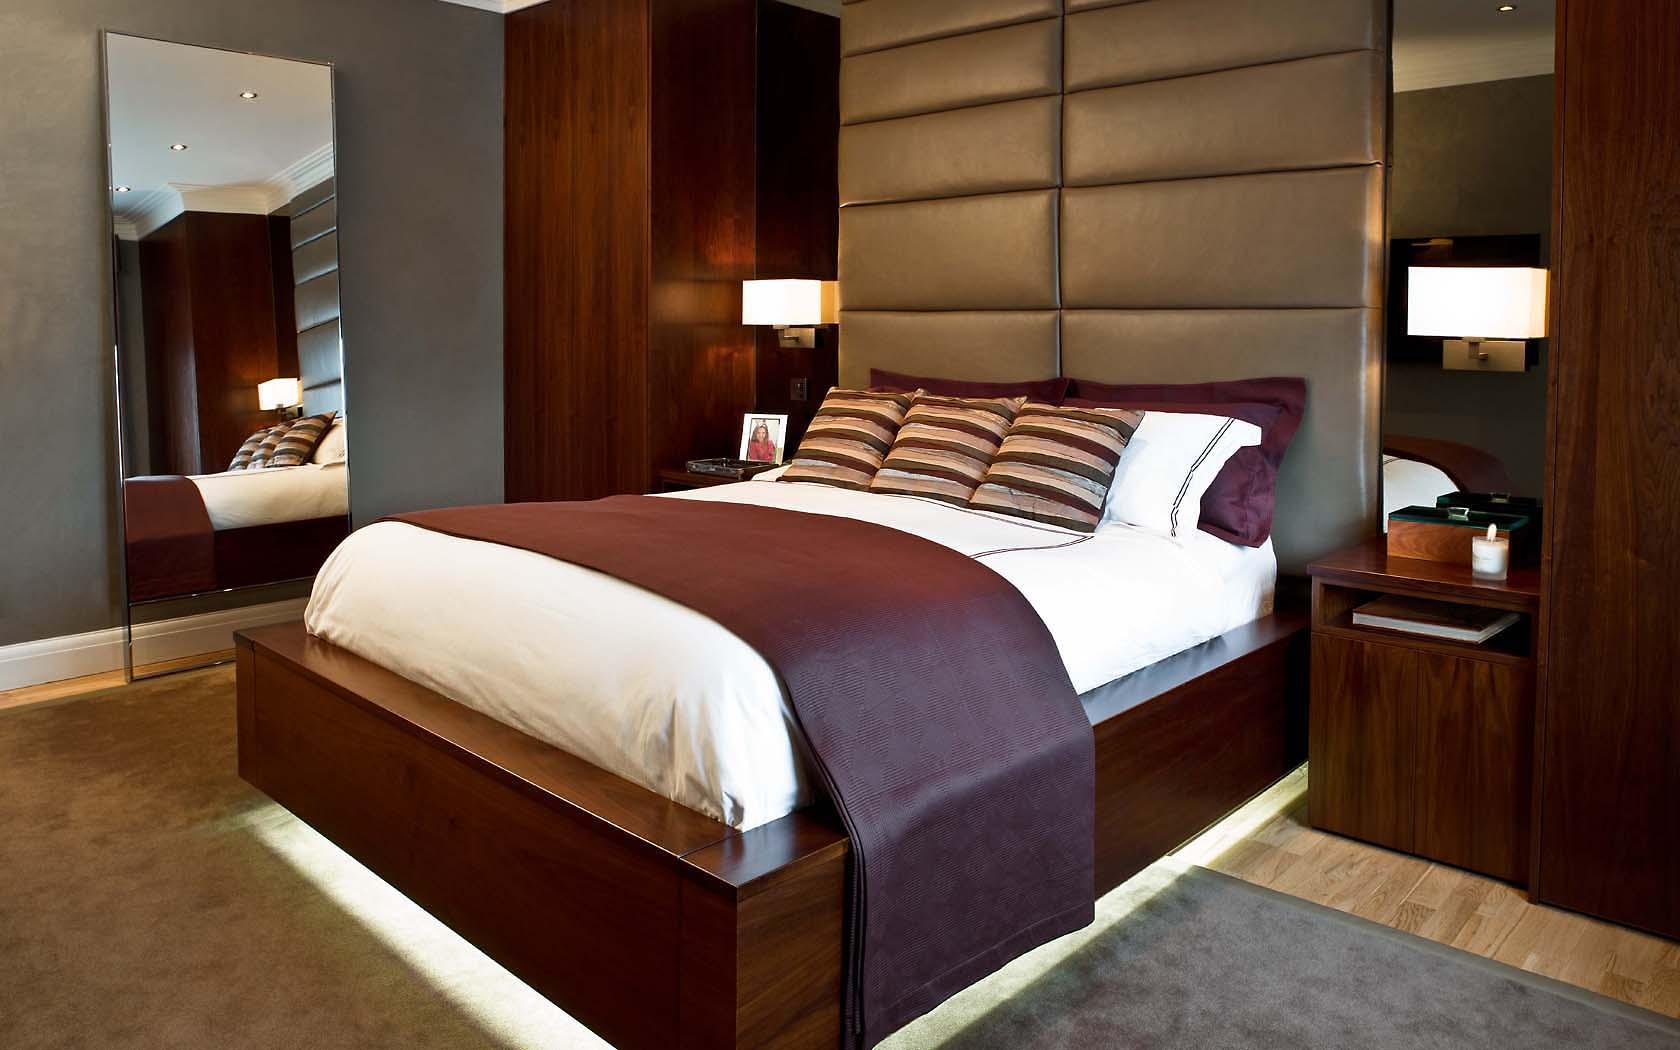 Bedroom Knightsbridge Penthouse